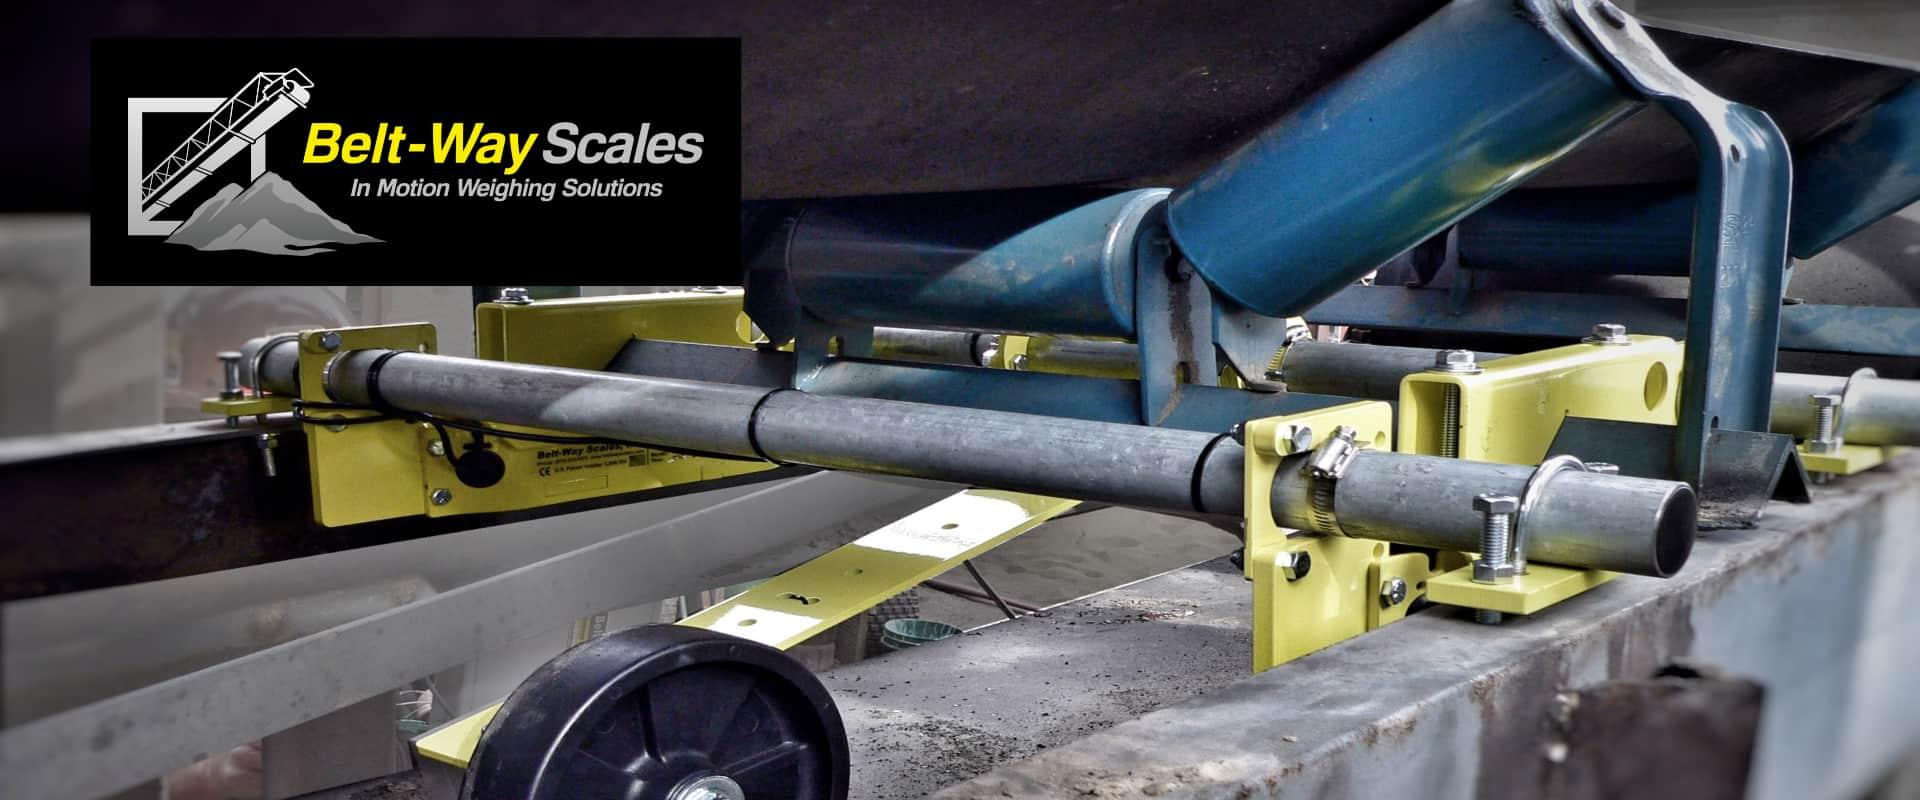 Loadsense beltway conveyor scales nz australia